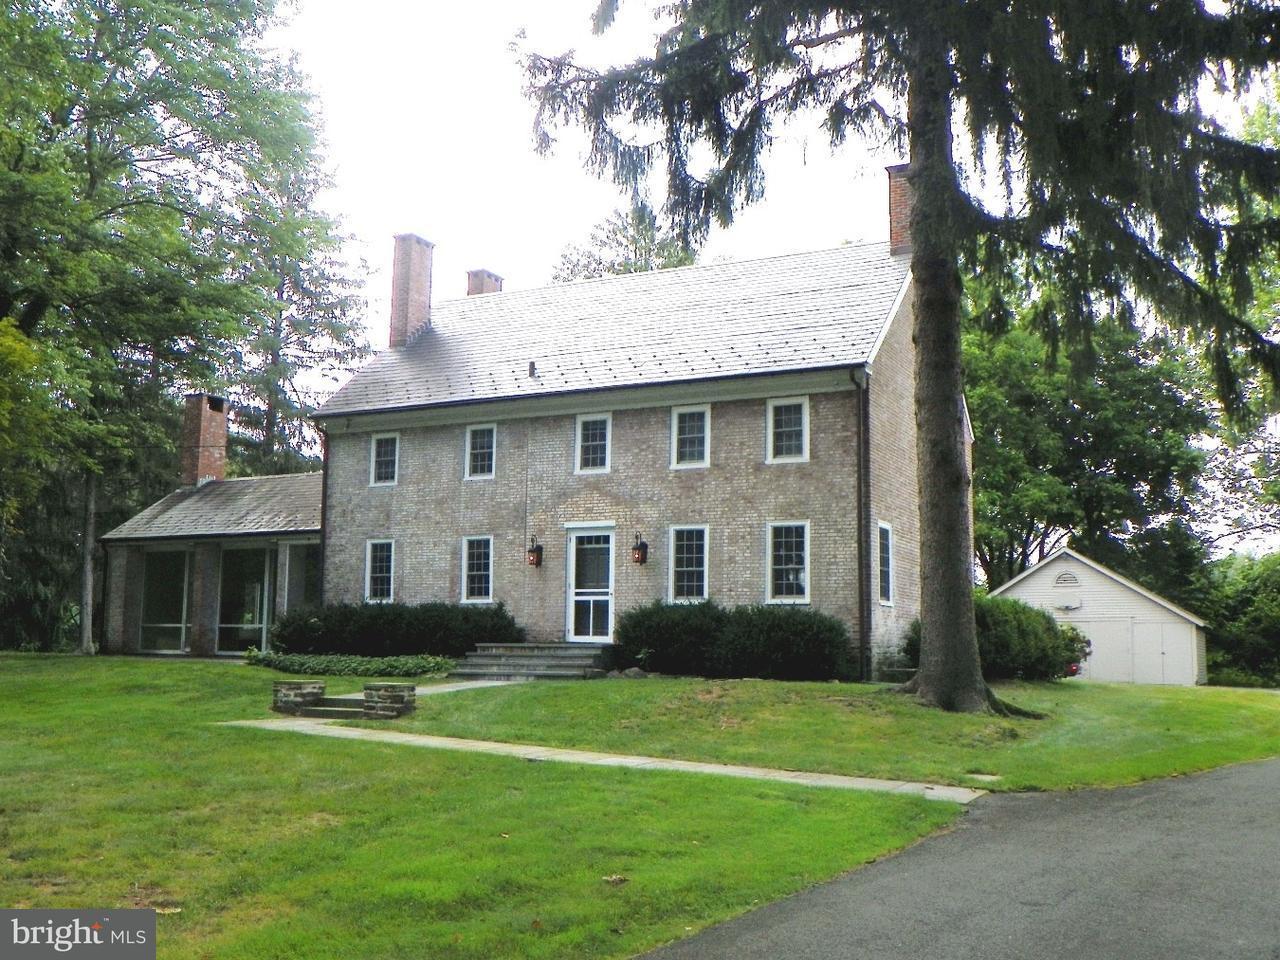 独户住宅 为 出租 在 2 LEWISVILLE Road 劳伦斯维尔, 新泽西州 08648 美国在/周边: Lawrence Township